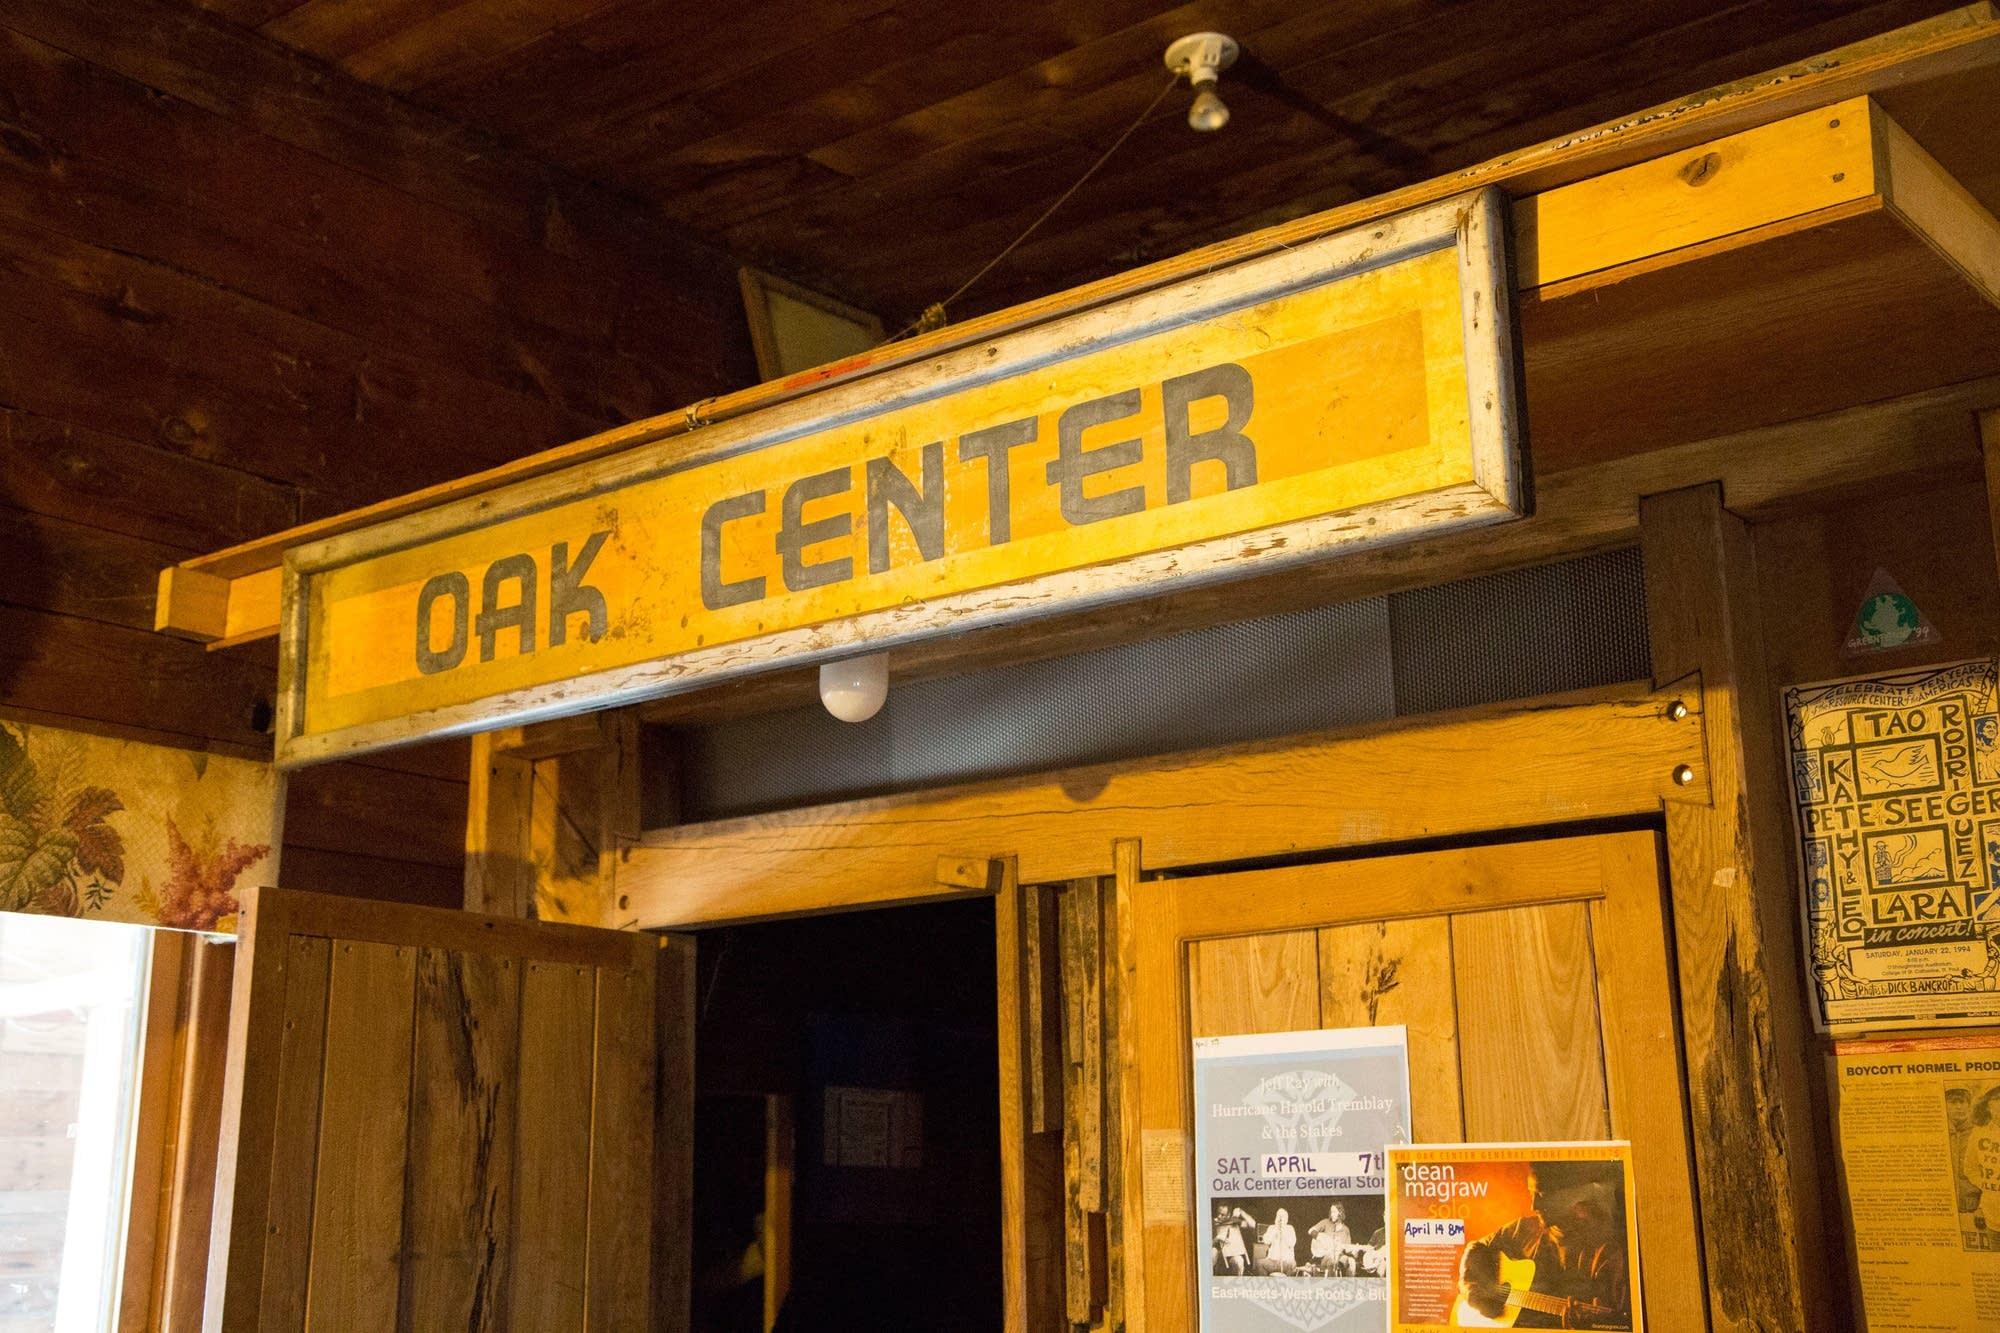 Oak Center General Store